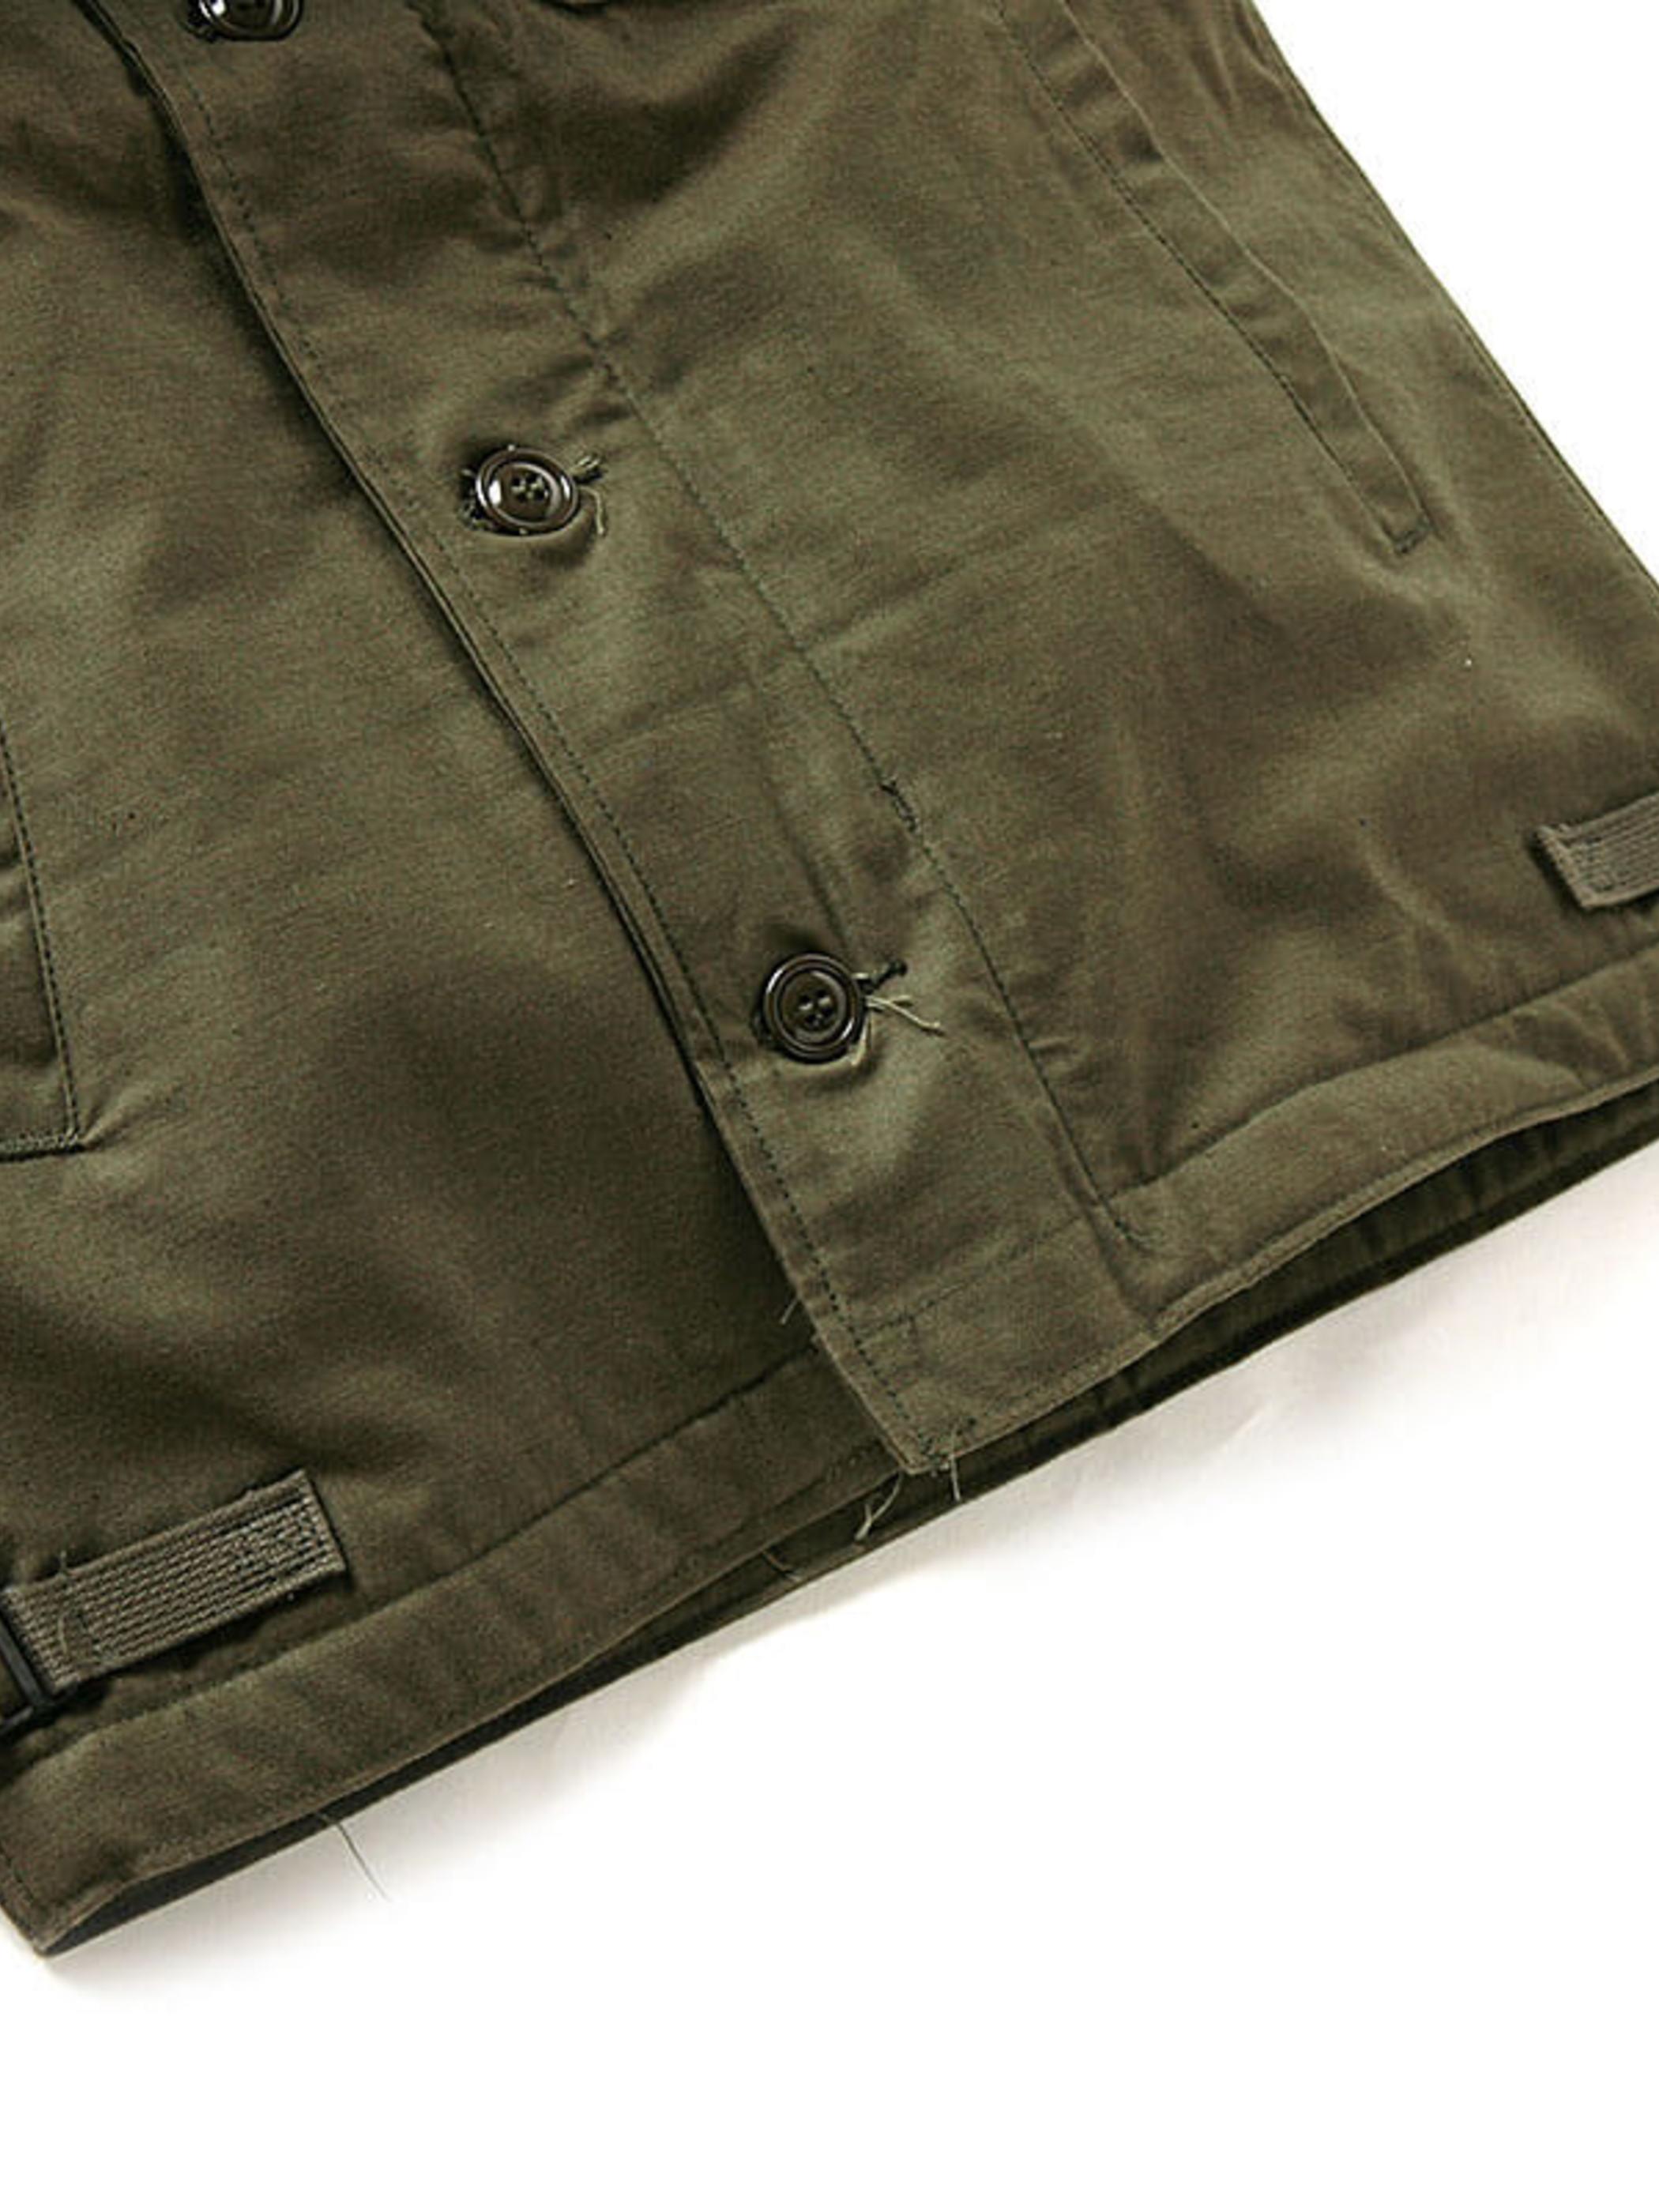 US Navy / Deadstock / A-2 Deck Jacket